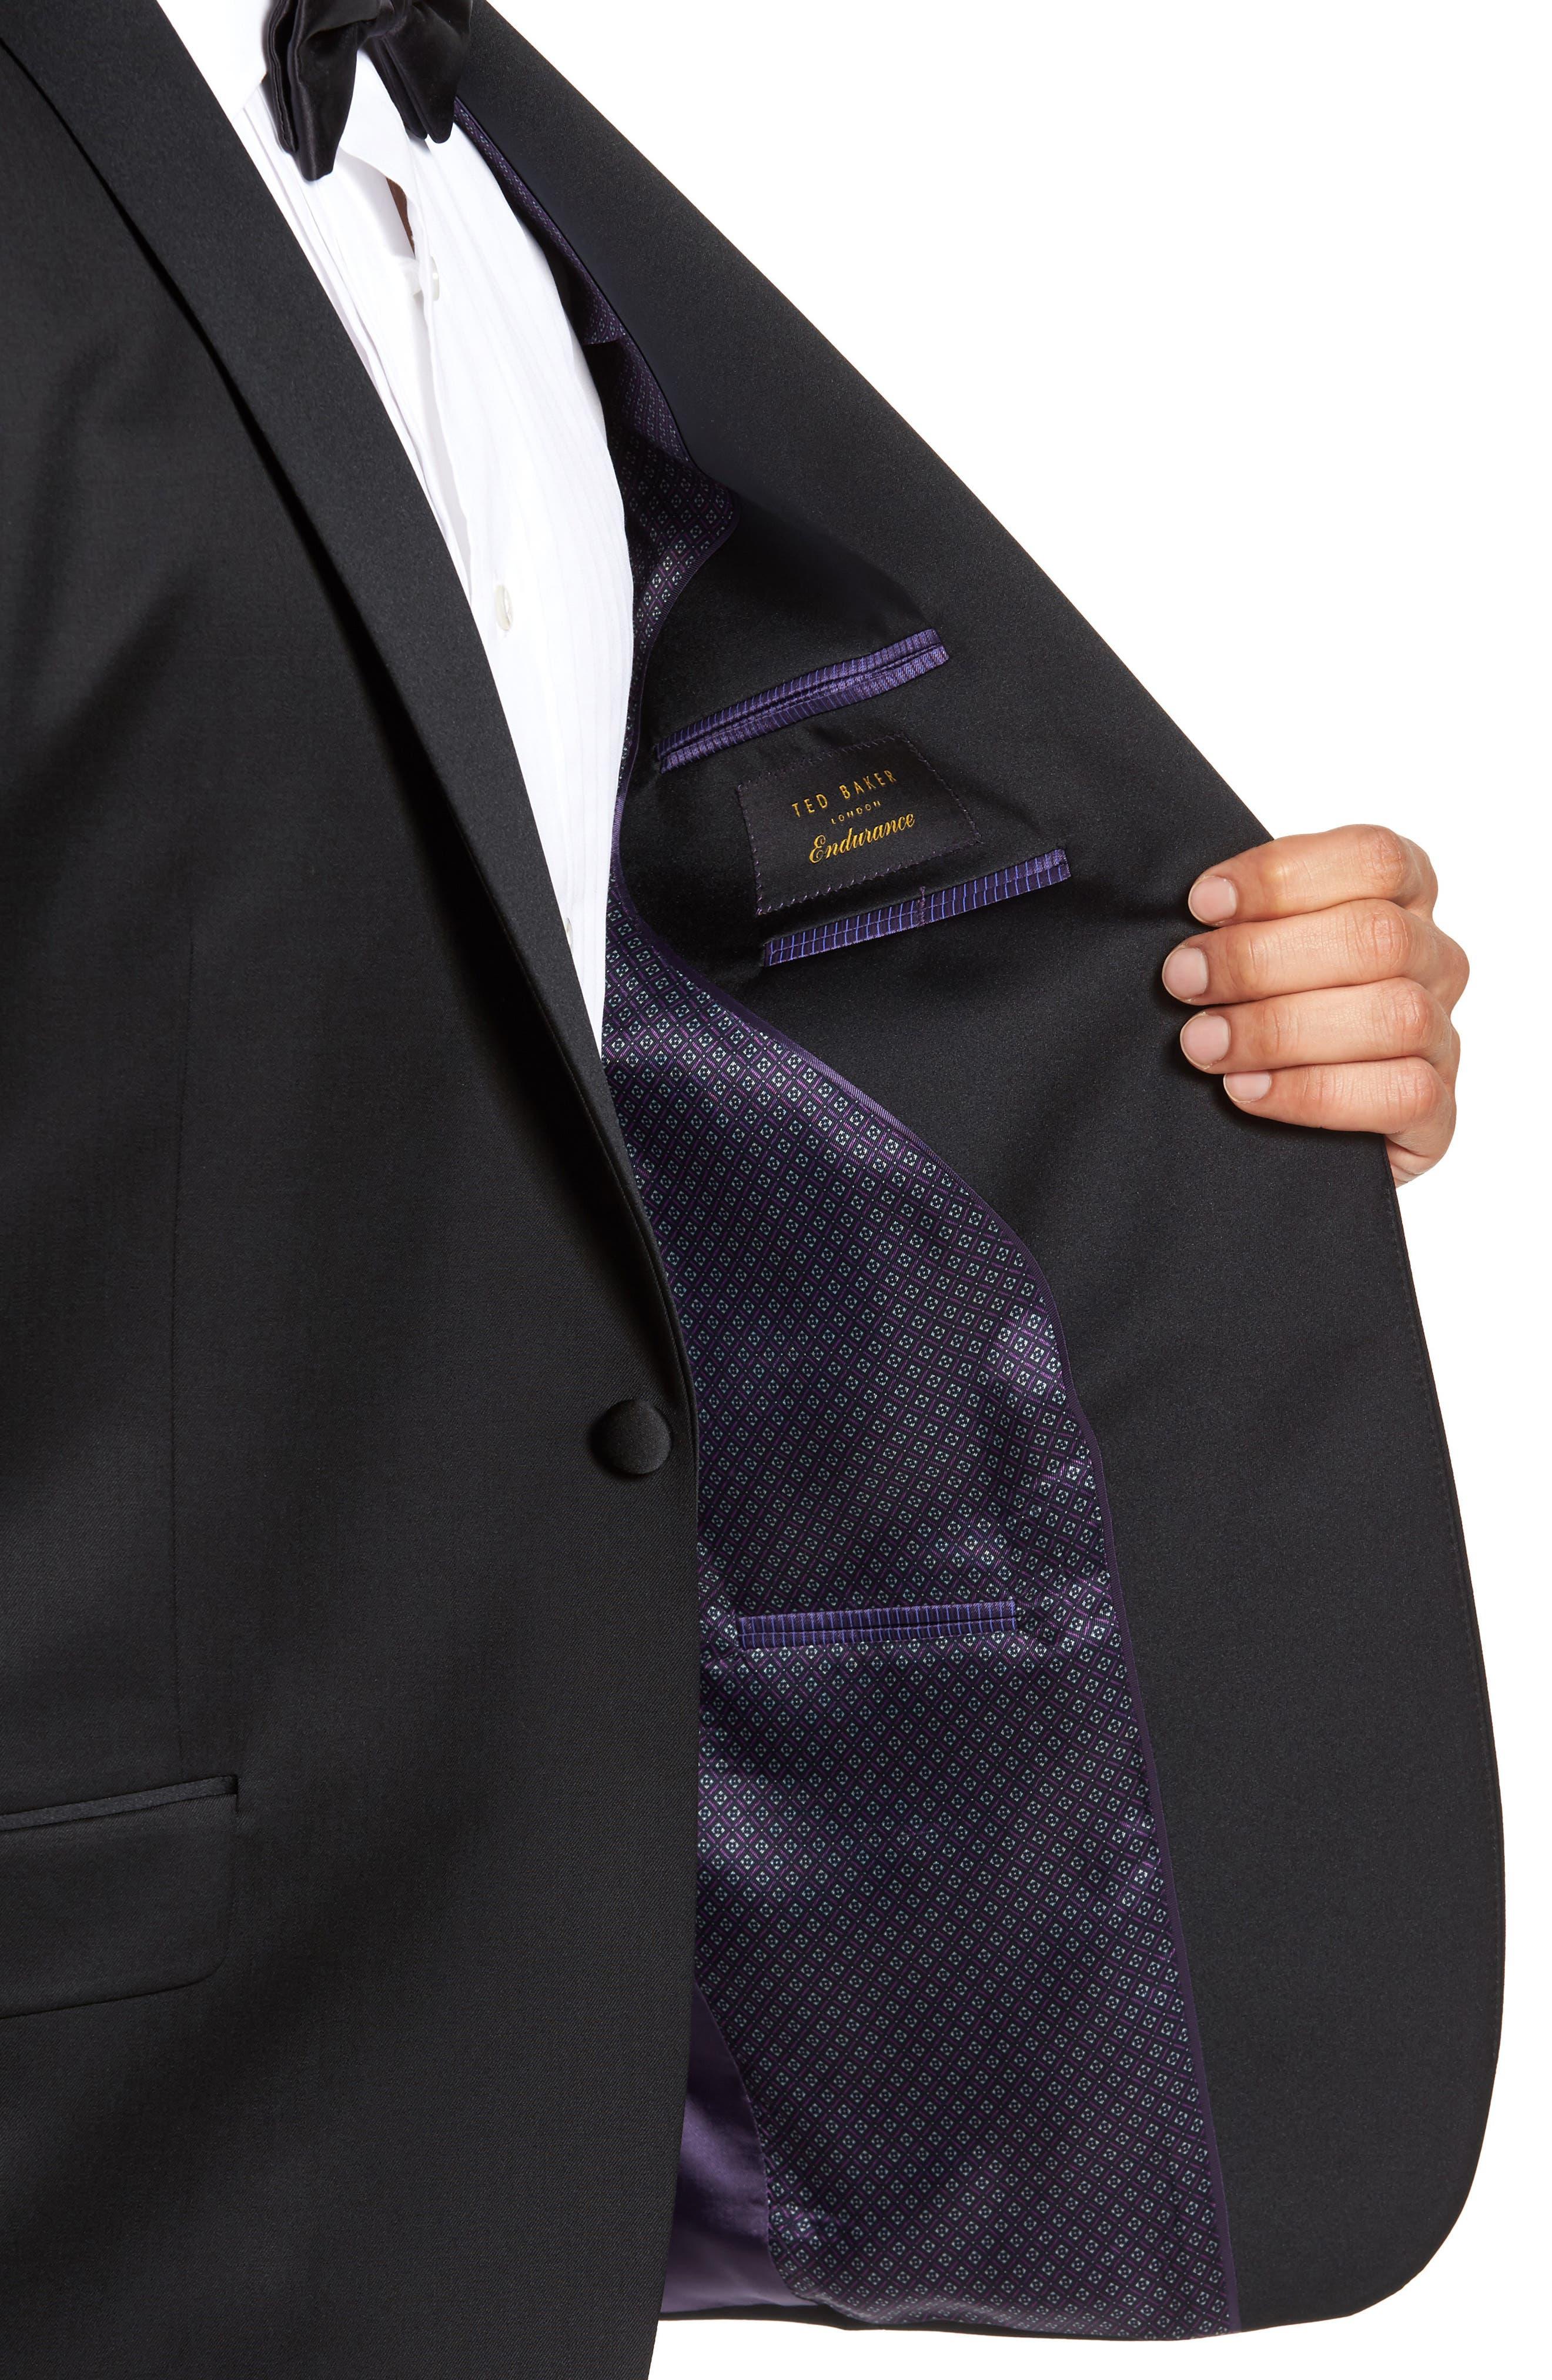 Josh Trim Fit Wool & Mohair Tuxedo,                             Alternate thumbnail 4, color,                             BLACK